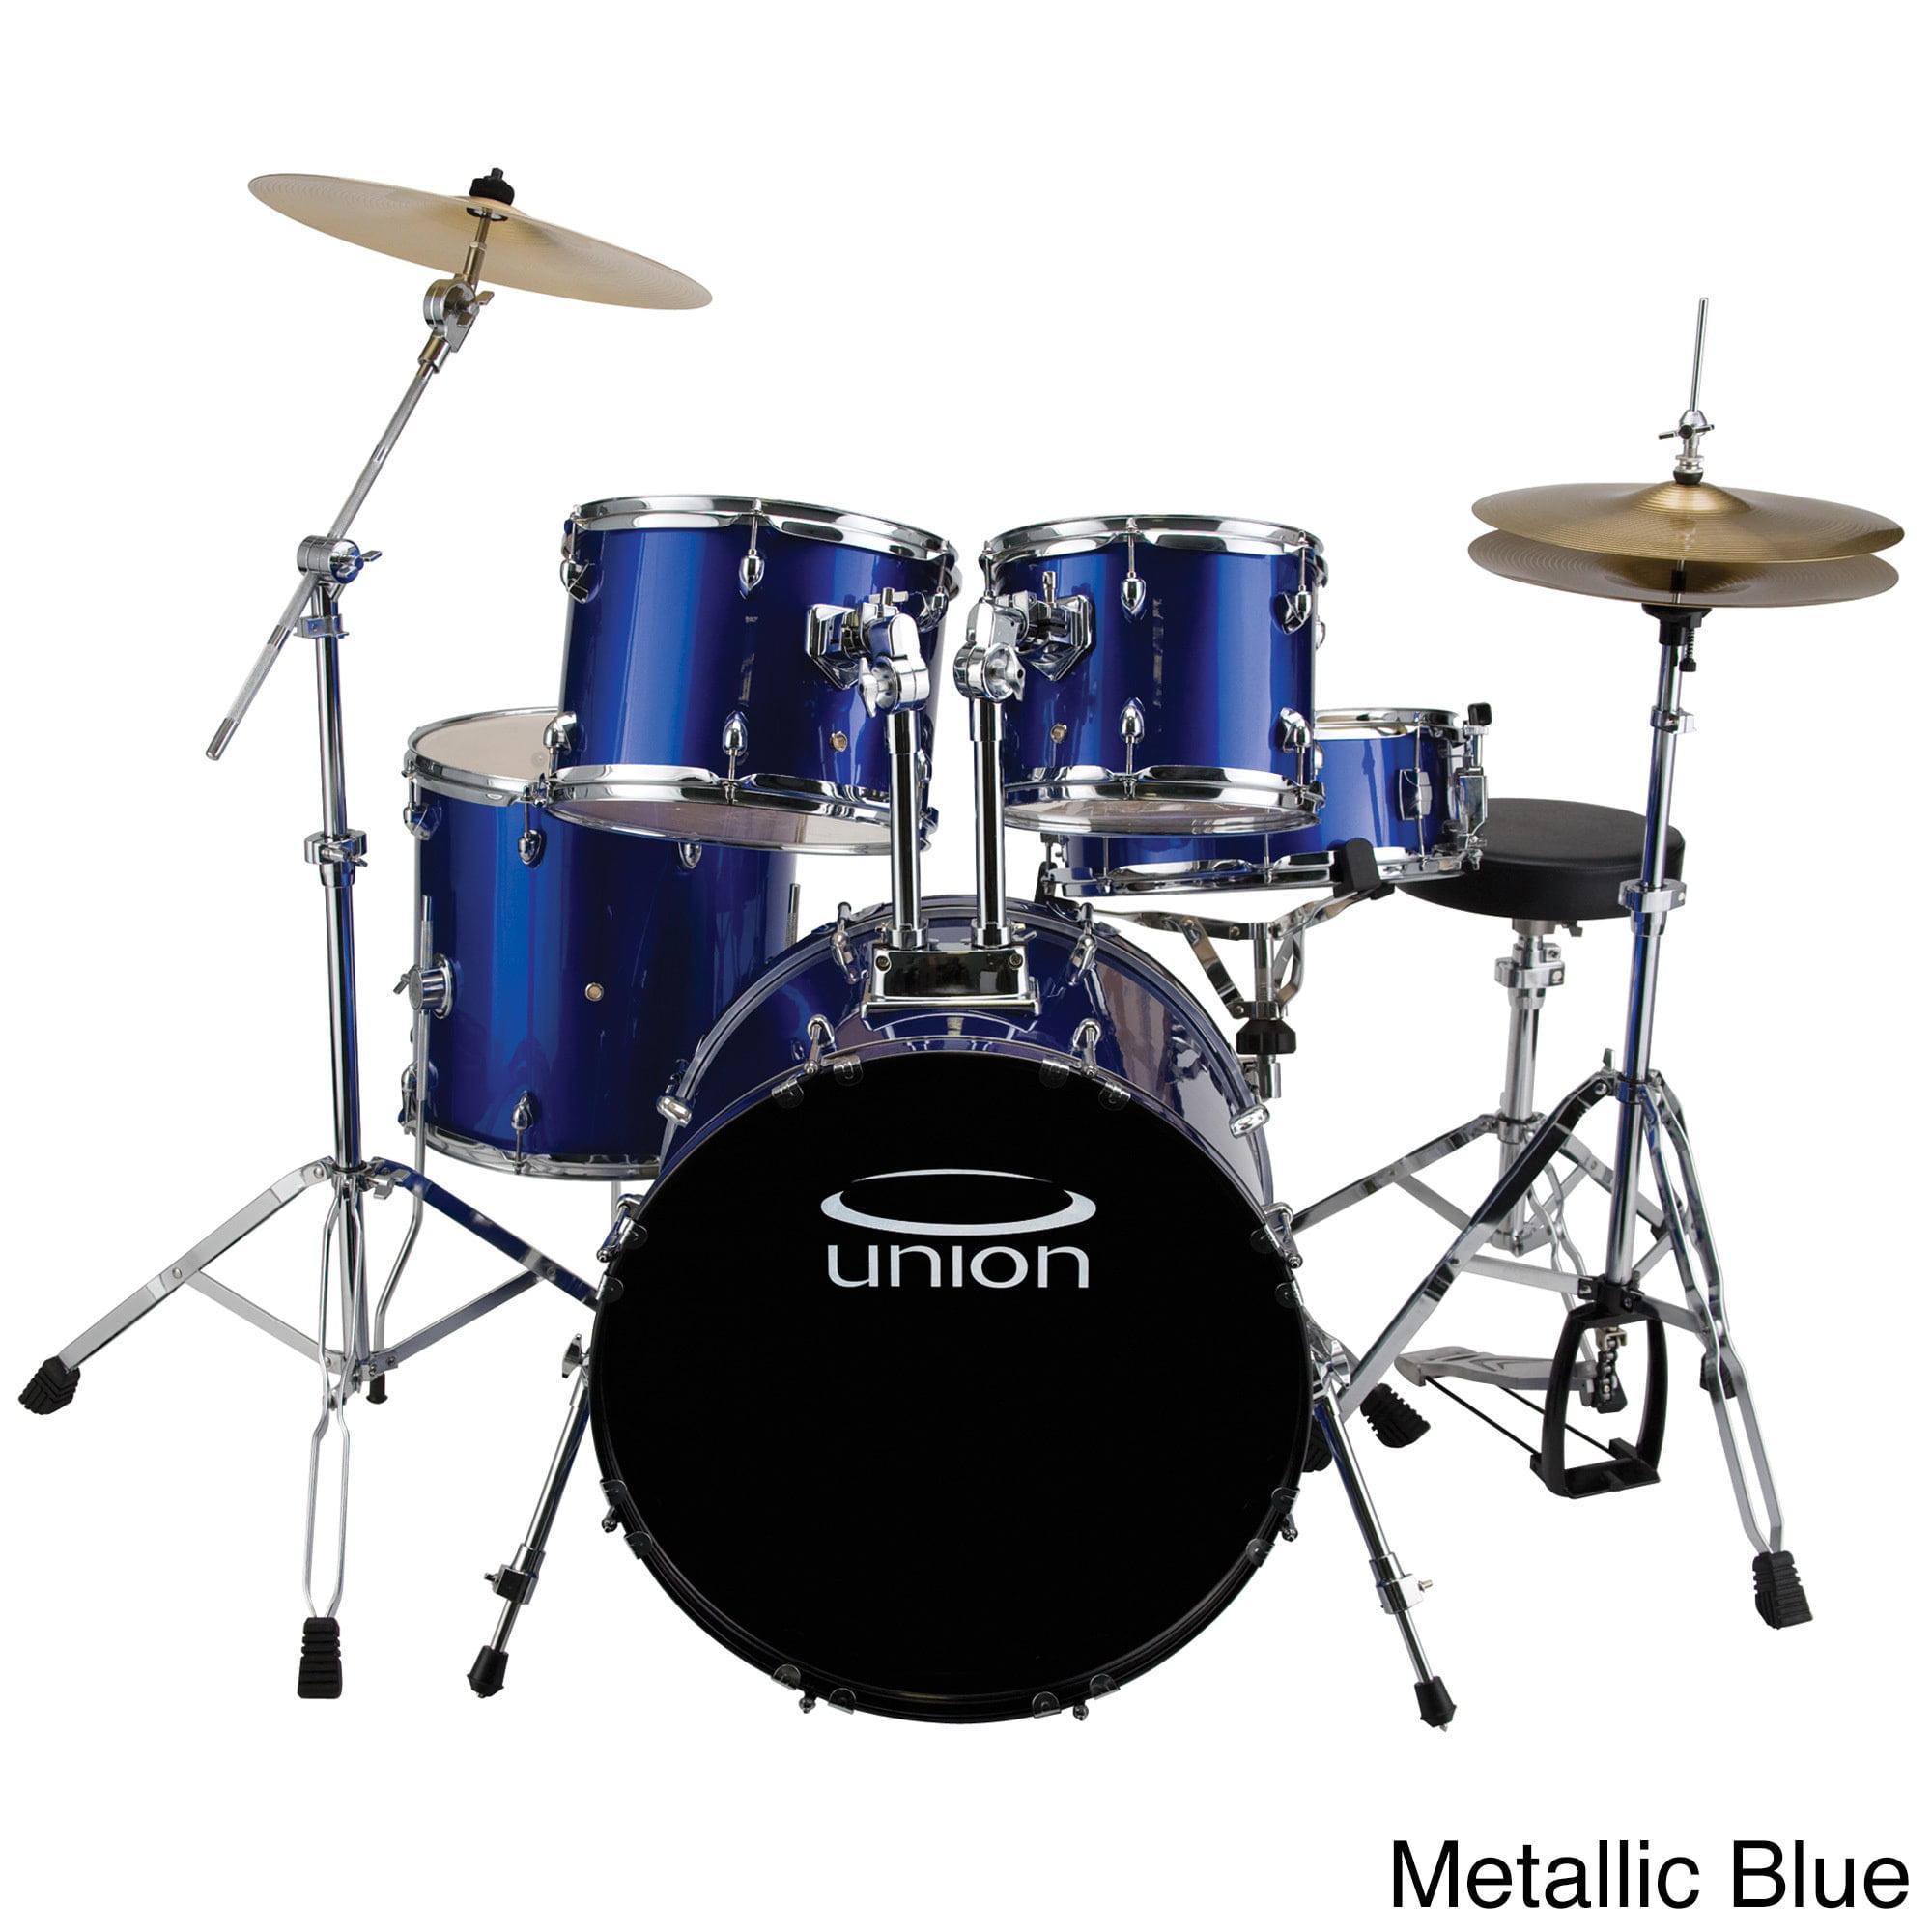 Union U5 5-Piece Jazz/Rock/Blues Drumset w/ Hardware, Cymbals & Throne - Dark Blue